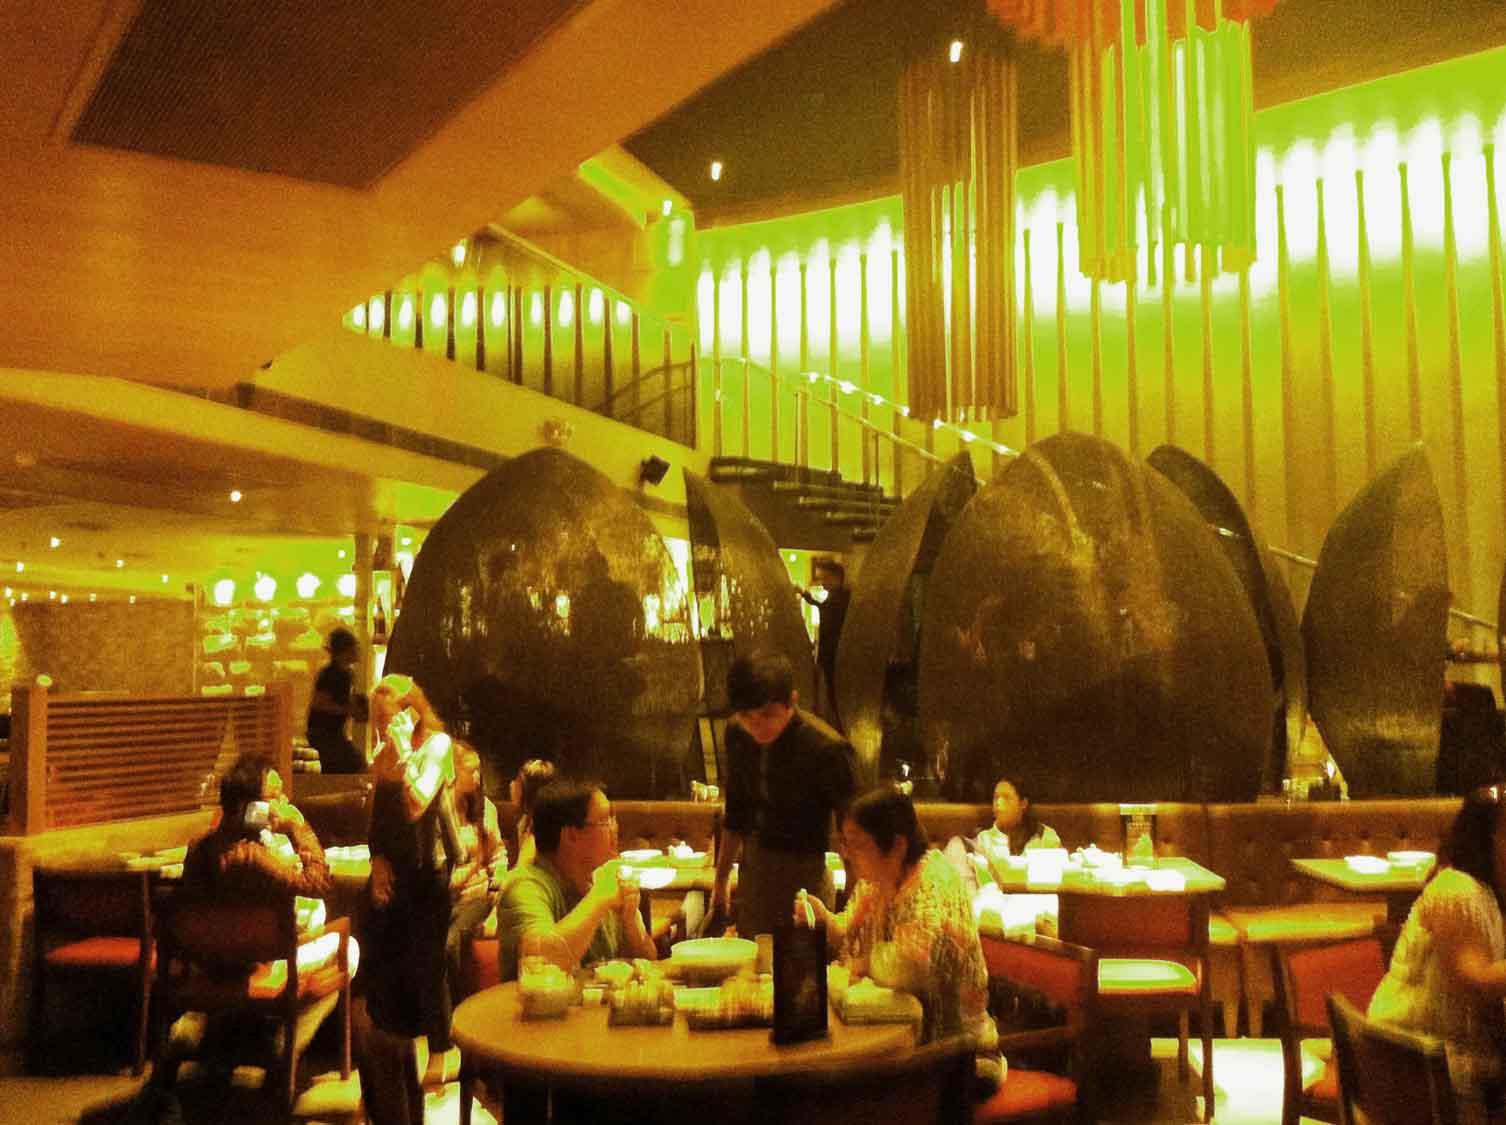 Wafu Izakaya Festival: A Japanese Pub & Street Food Feast